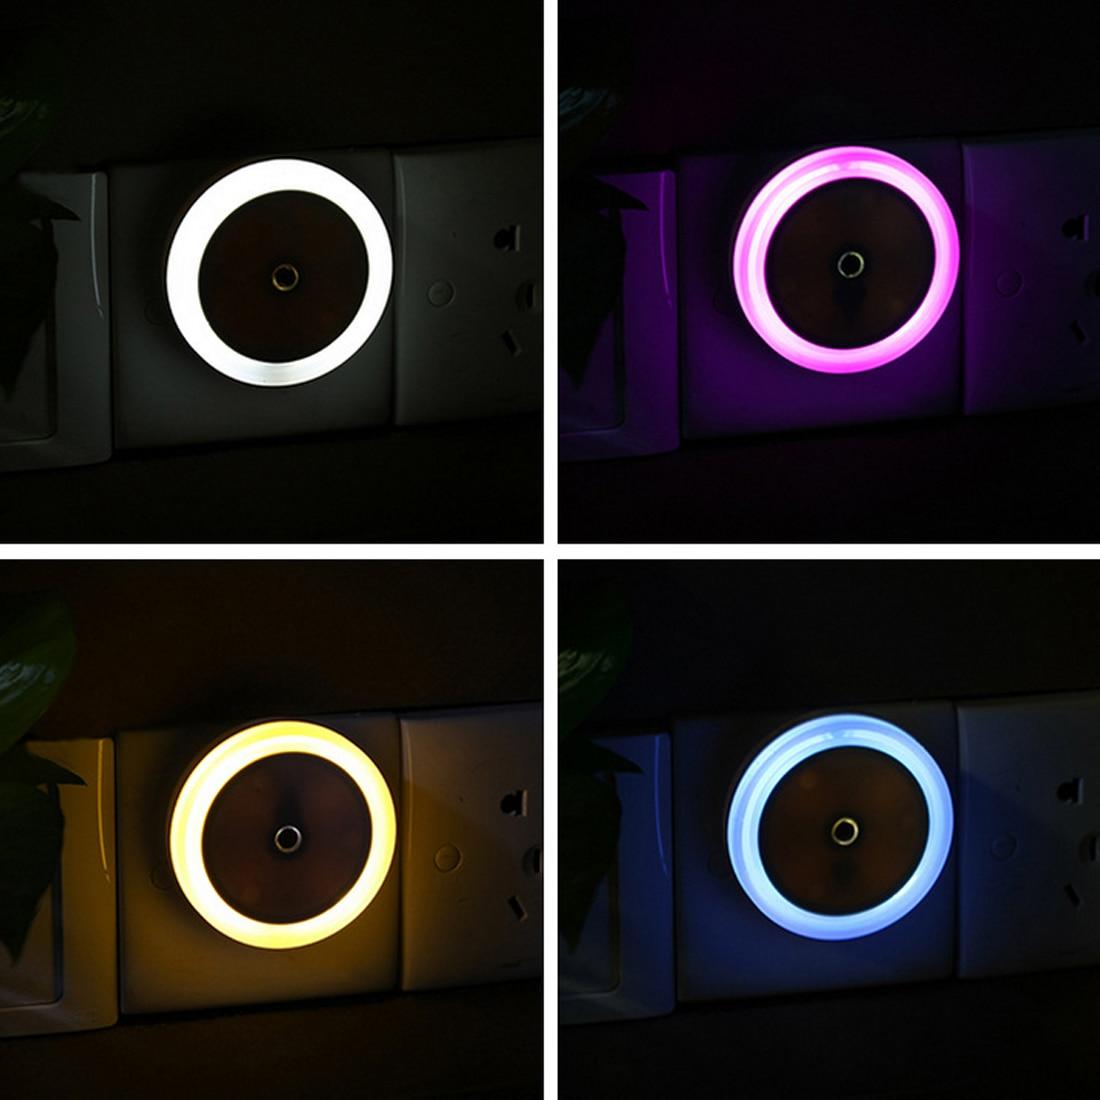 1 St Auto Led Licht Inductie Sensor Controle Slaapkamer Night Lights Bed Lamp Ronde Vorm 110-220 V 4 Kleuren Us Plug